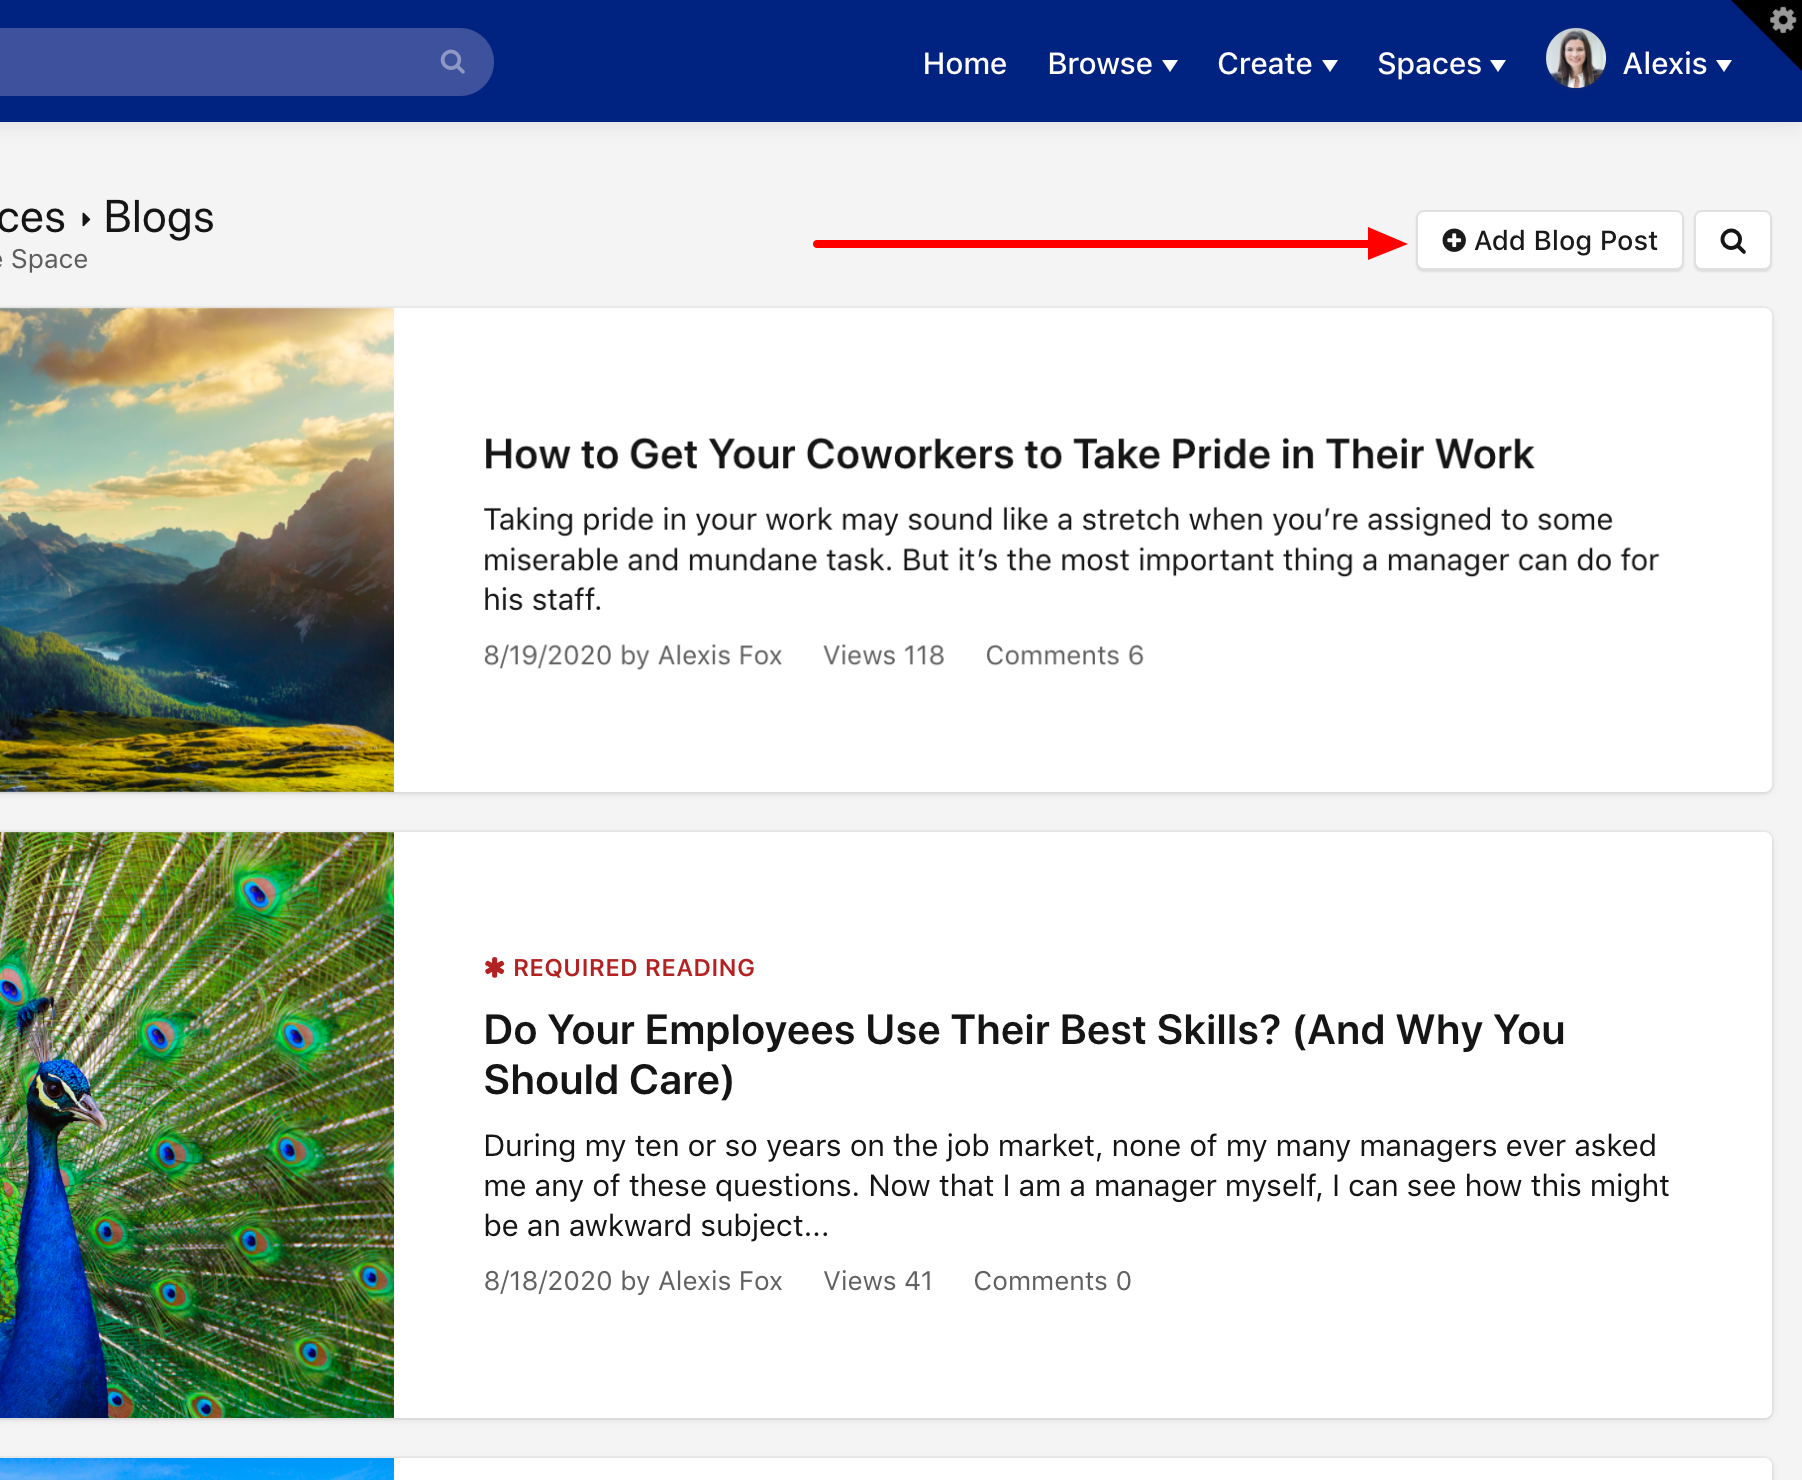 Click Add Blog Post